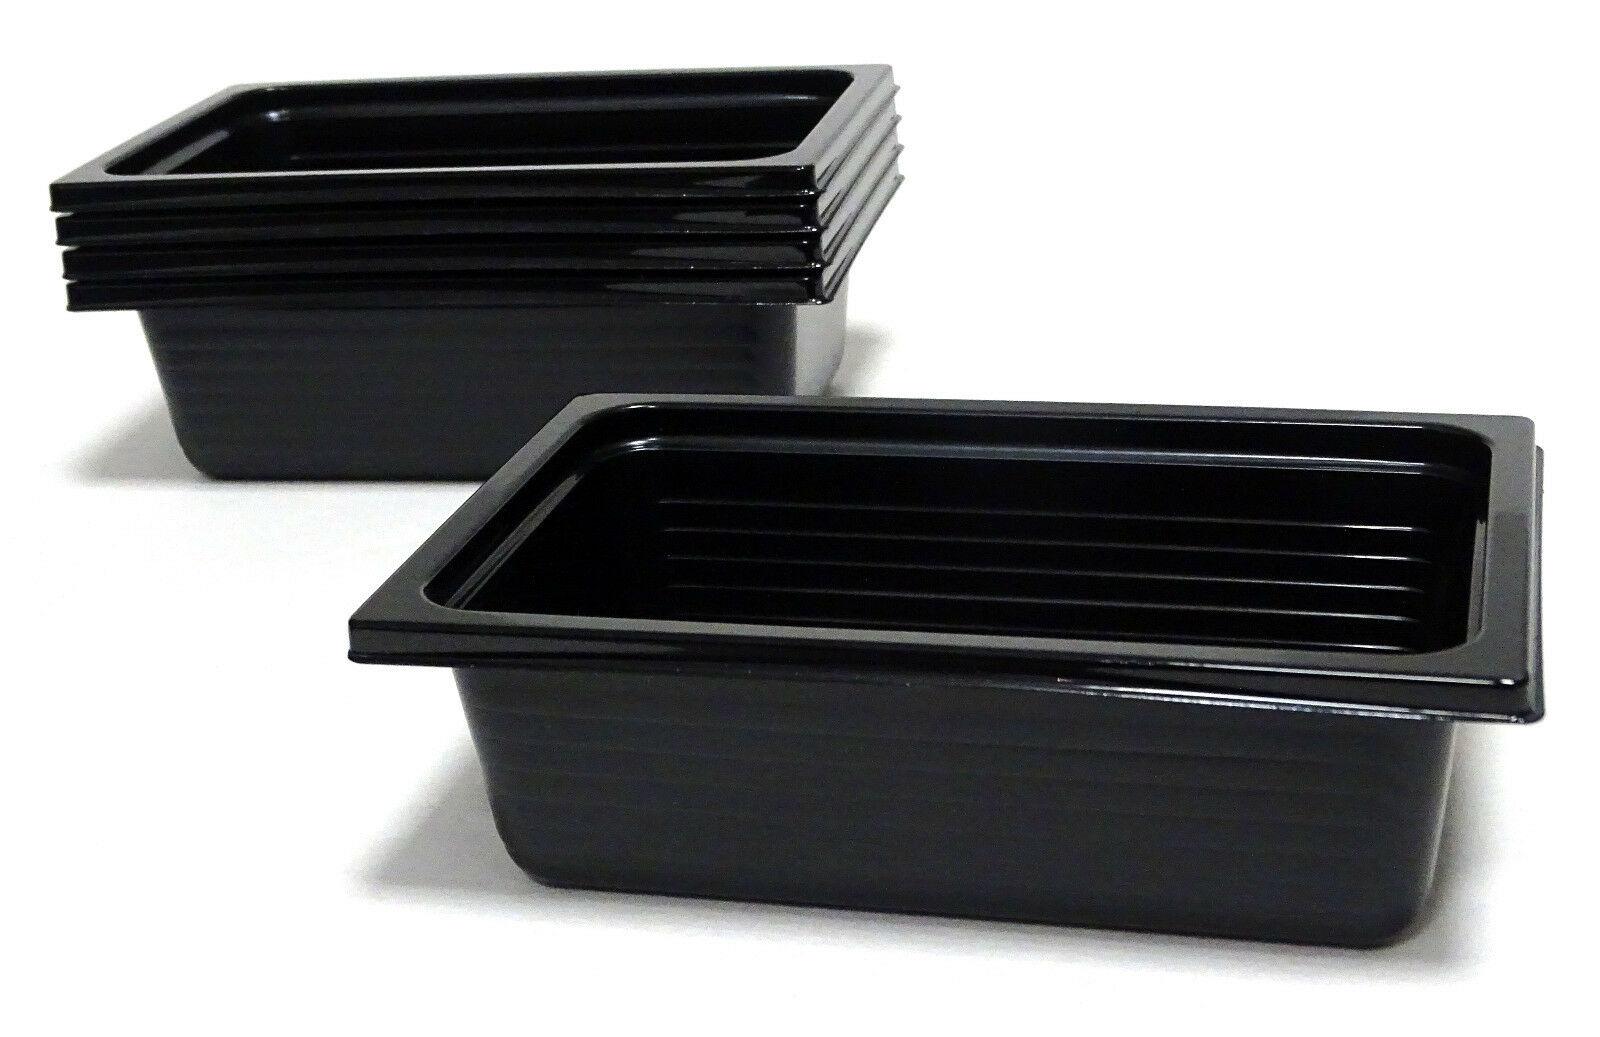 100 - 500 Stück Einweg Menüschale 500 ml CPET Schalen 161 x 102 x 50 mm schwarz - 100 Stück